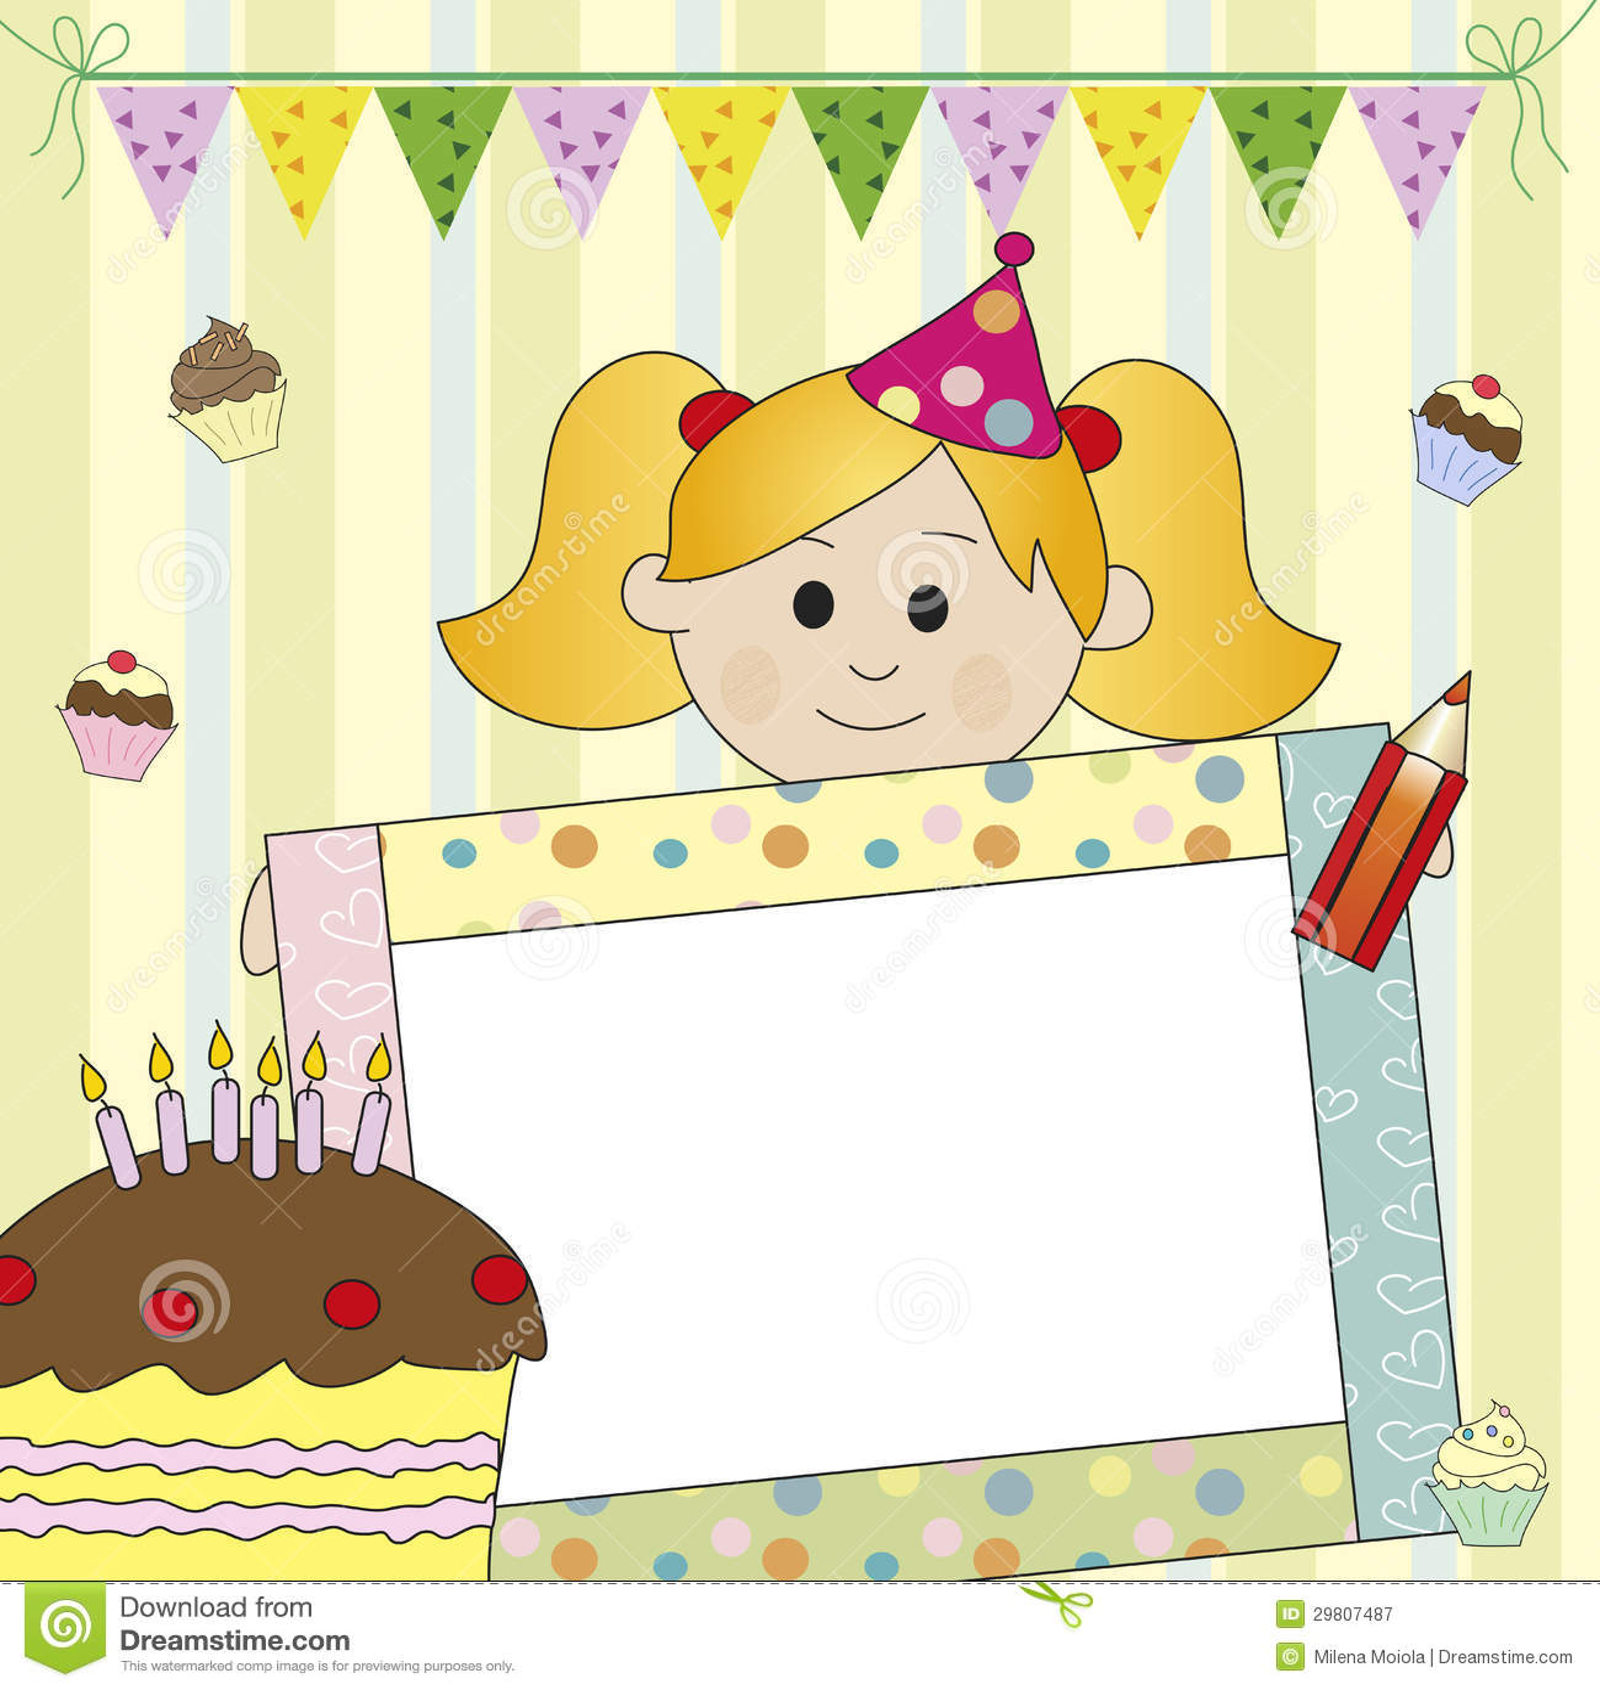 Happy Birthday Girl Illustration ~ Birthday girl royalty free stock photography image